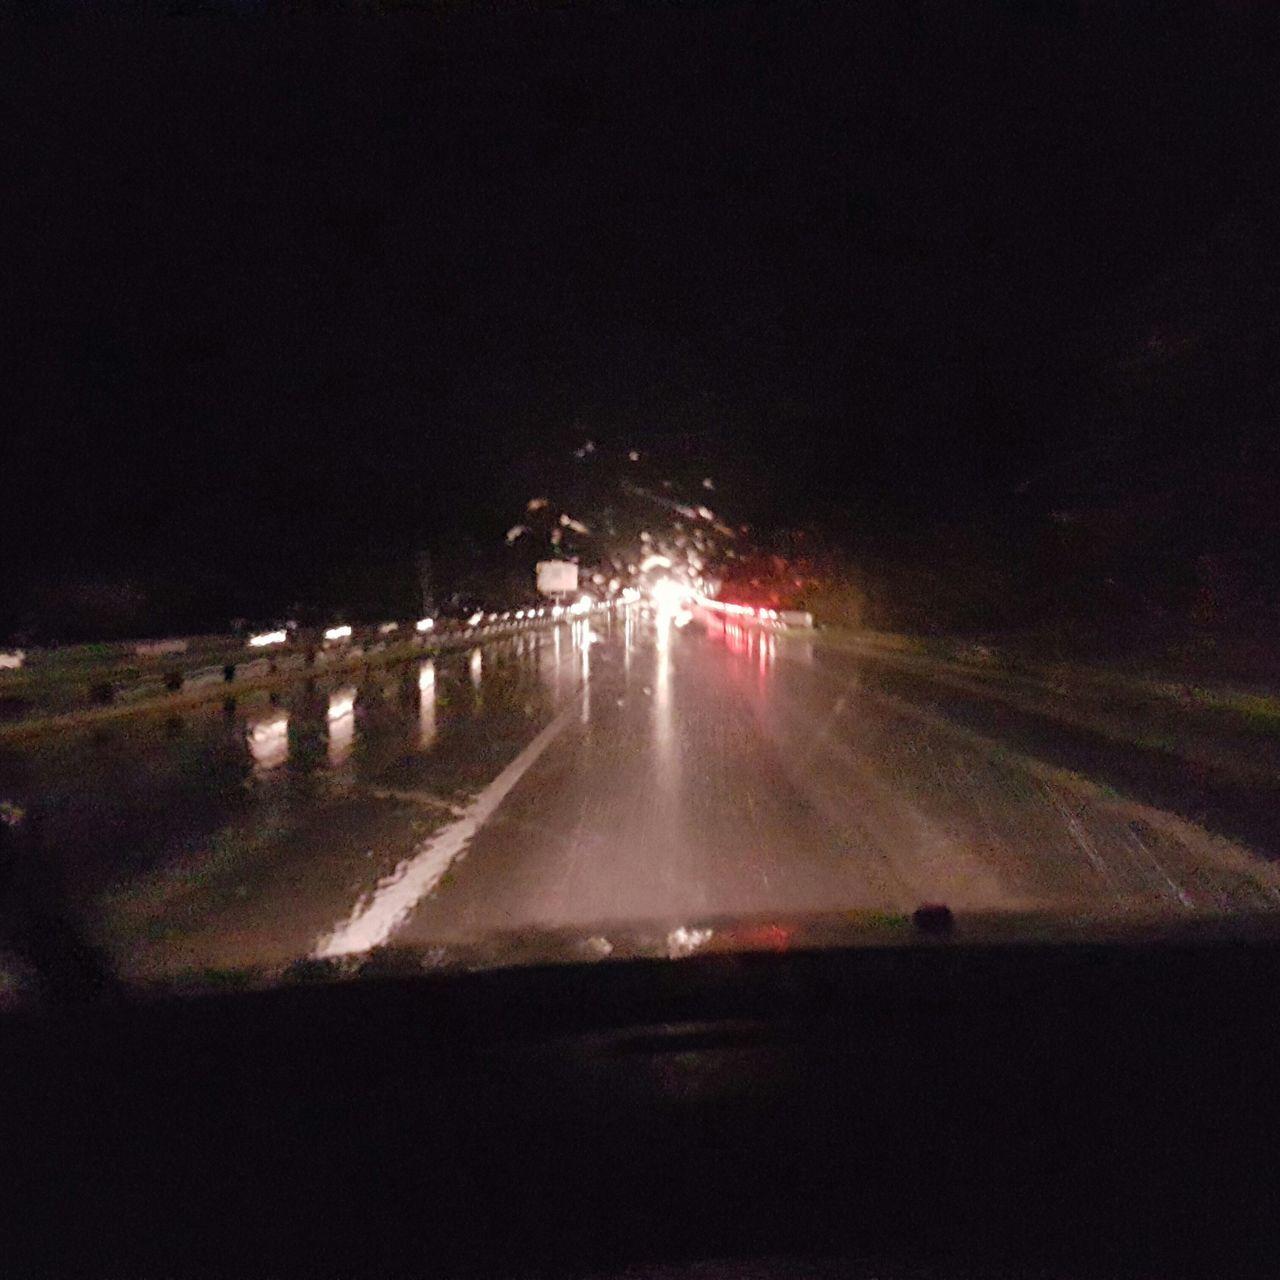 night, illuminated, road, transportation, long exposure, no people, motion, outdoors, sky